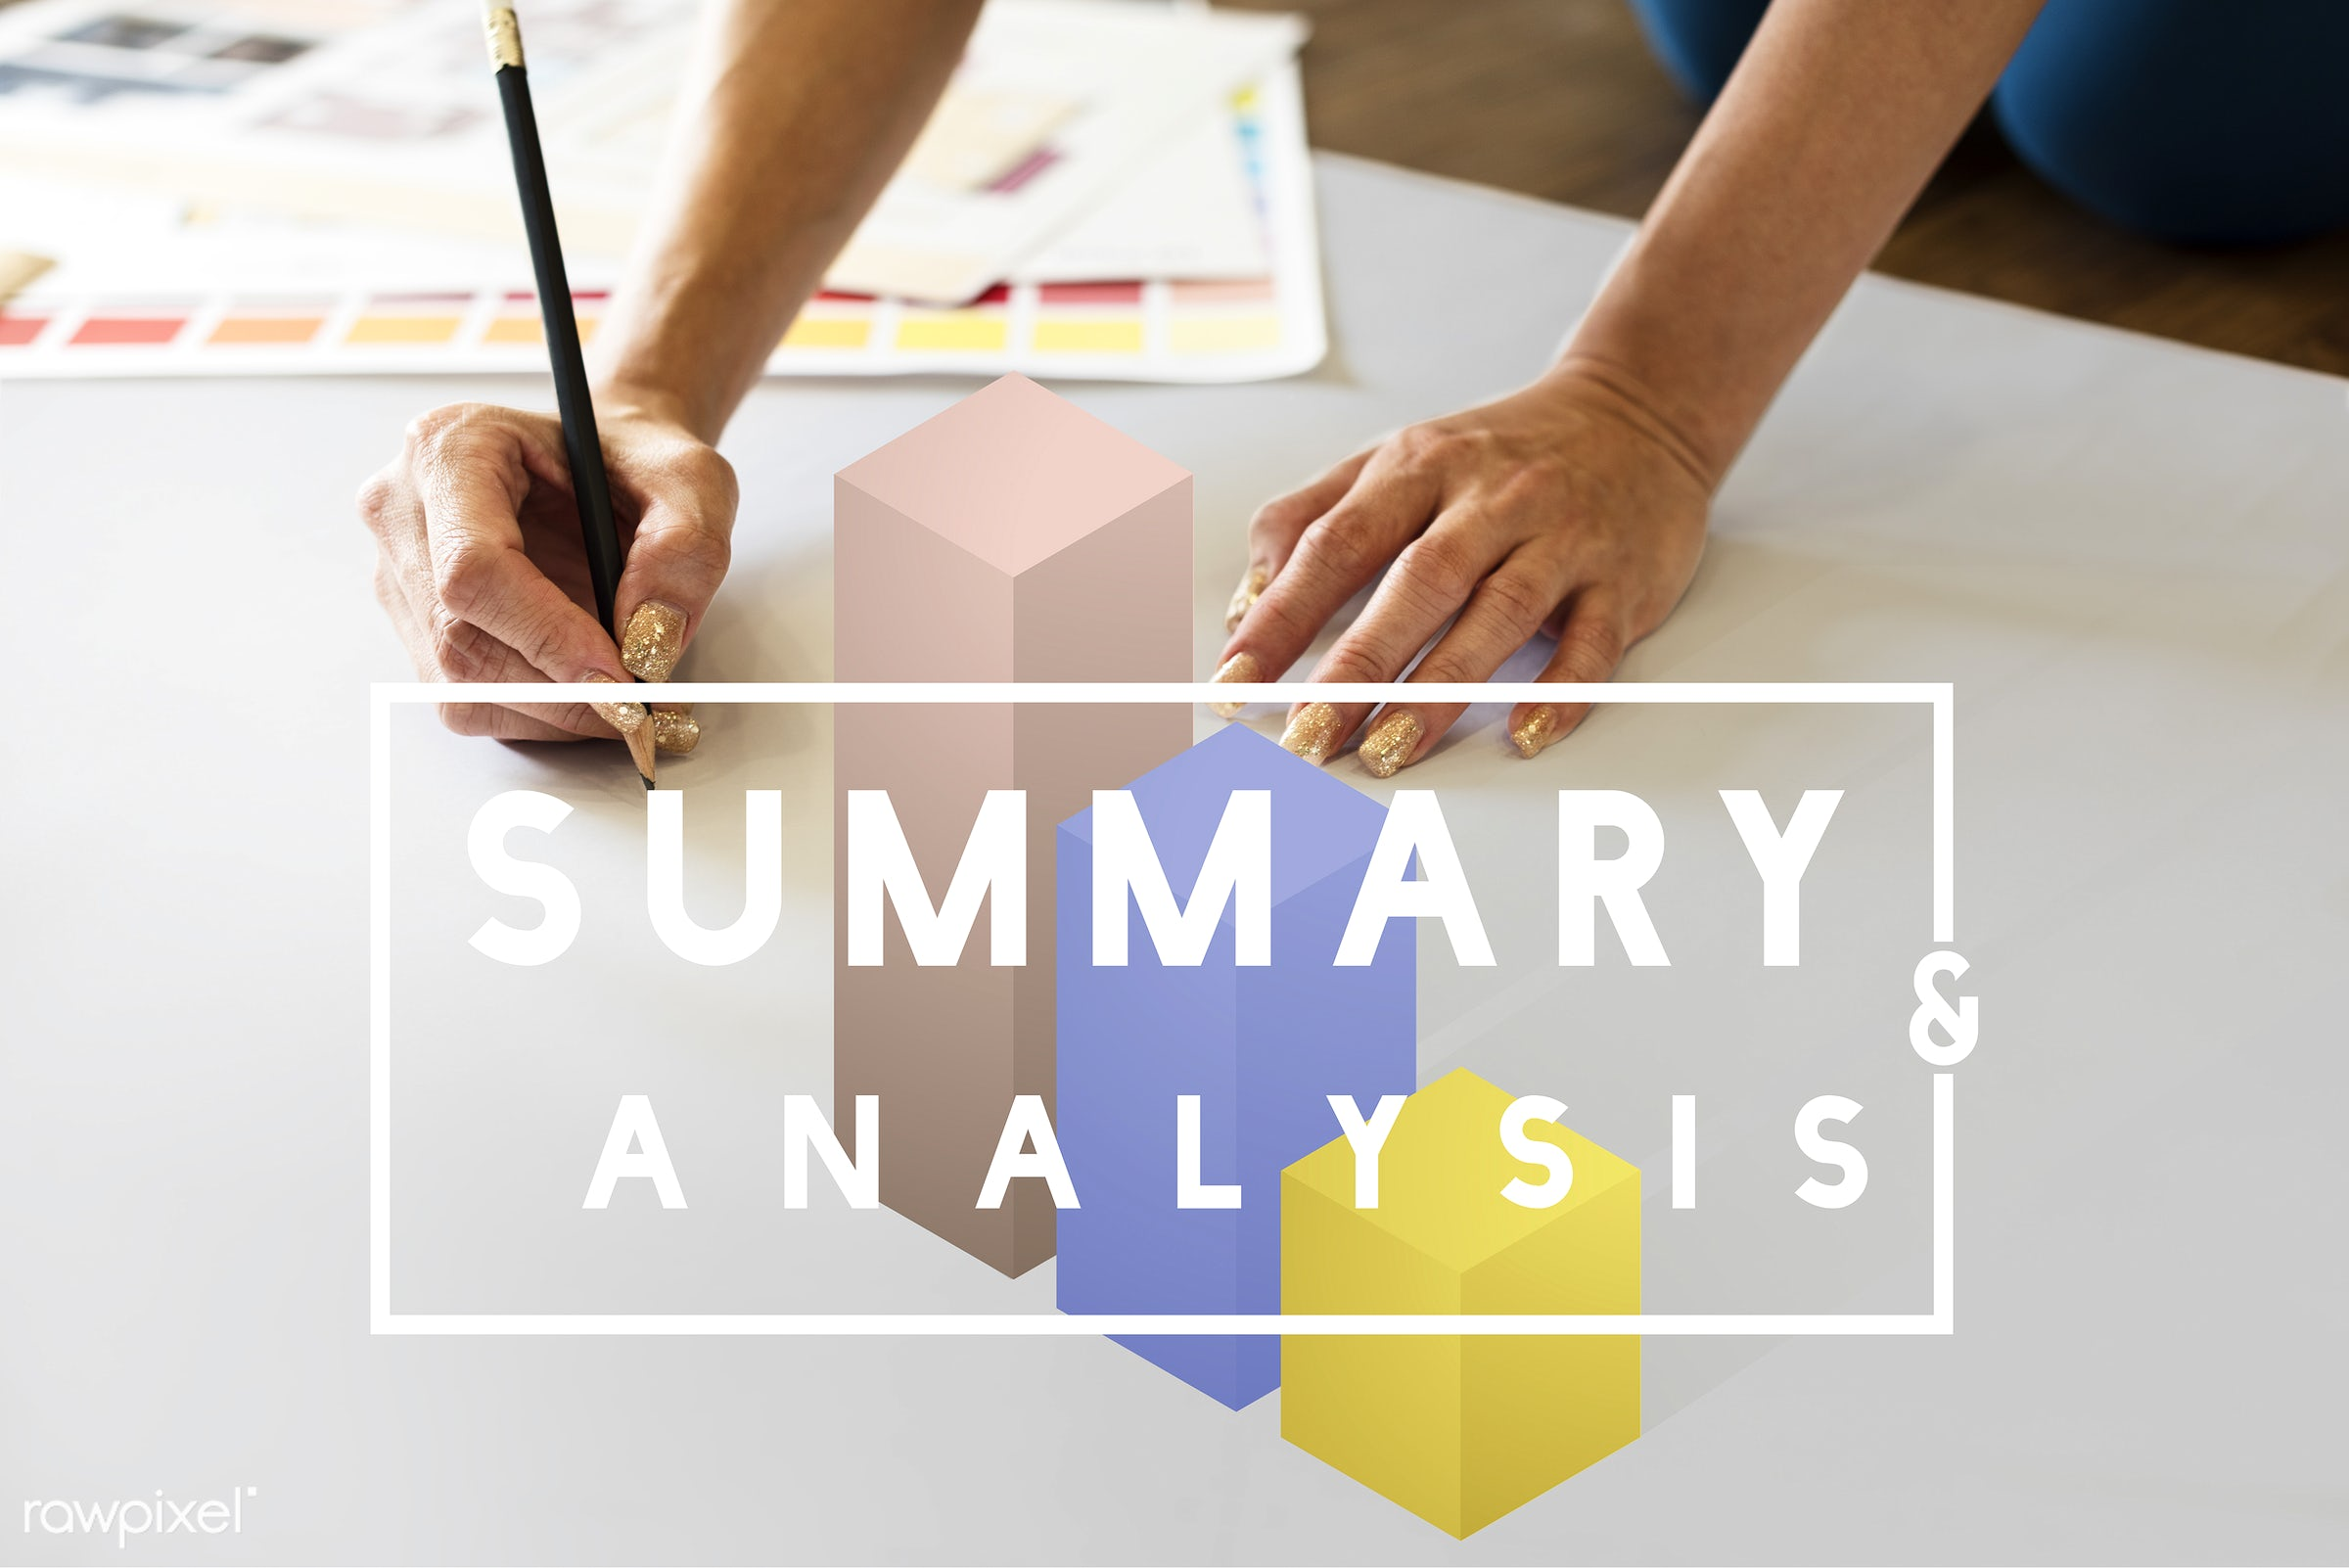 analysis, analytics, analyze, art, creation, creative, creativity, data, data analysis, design, drawing, hands, ideas,...